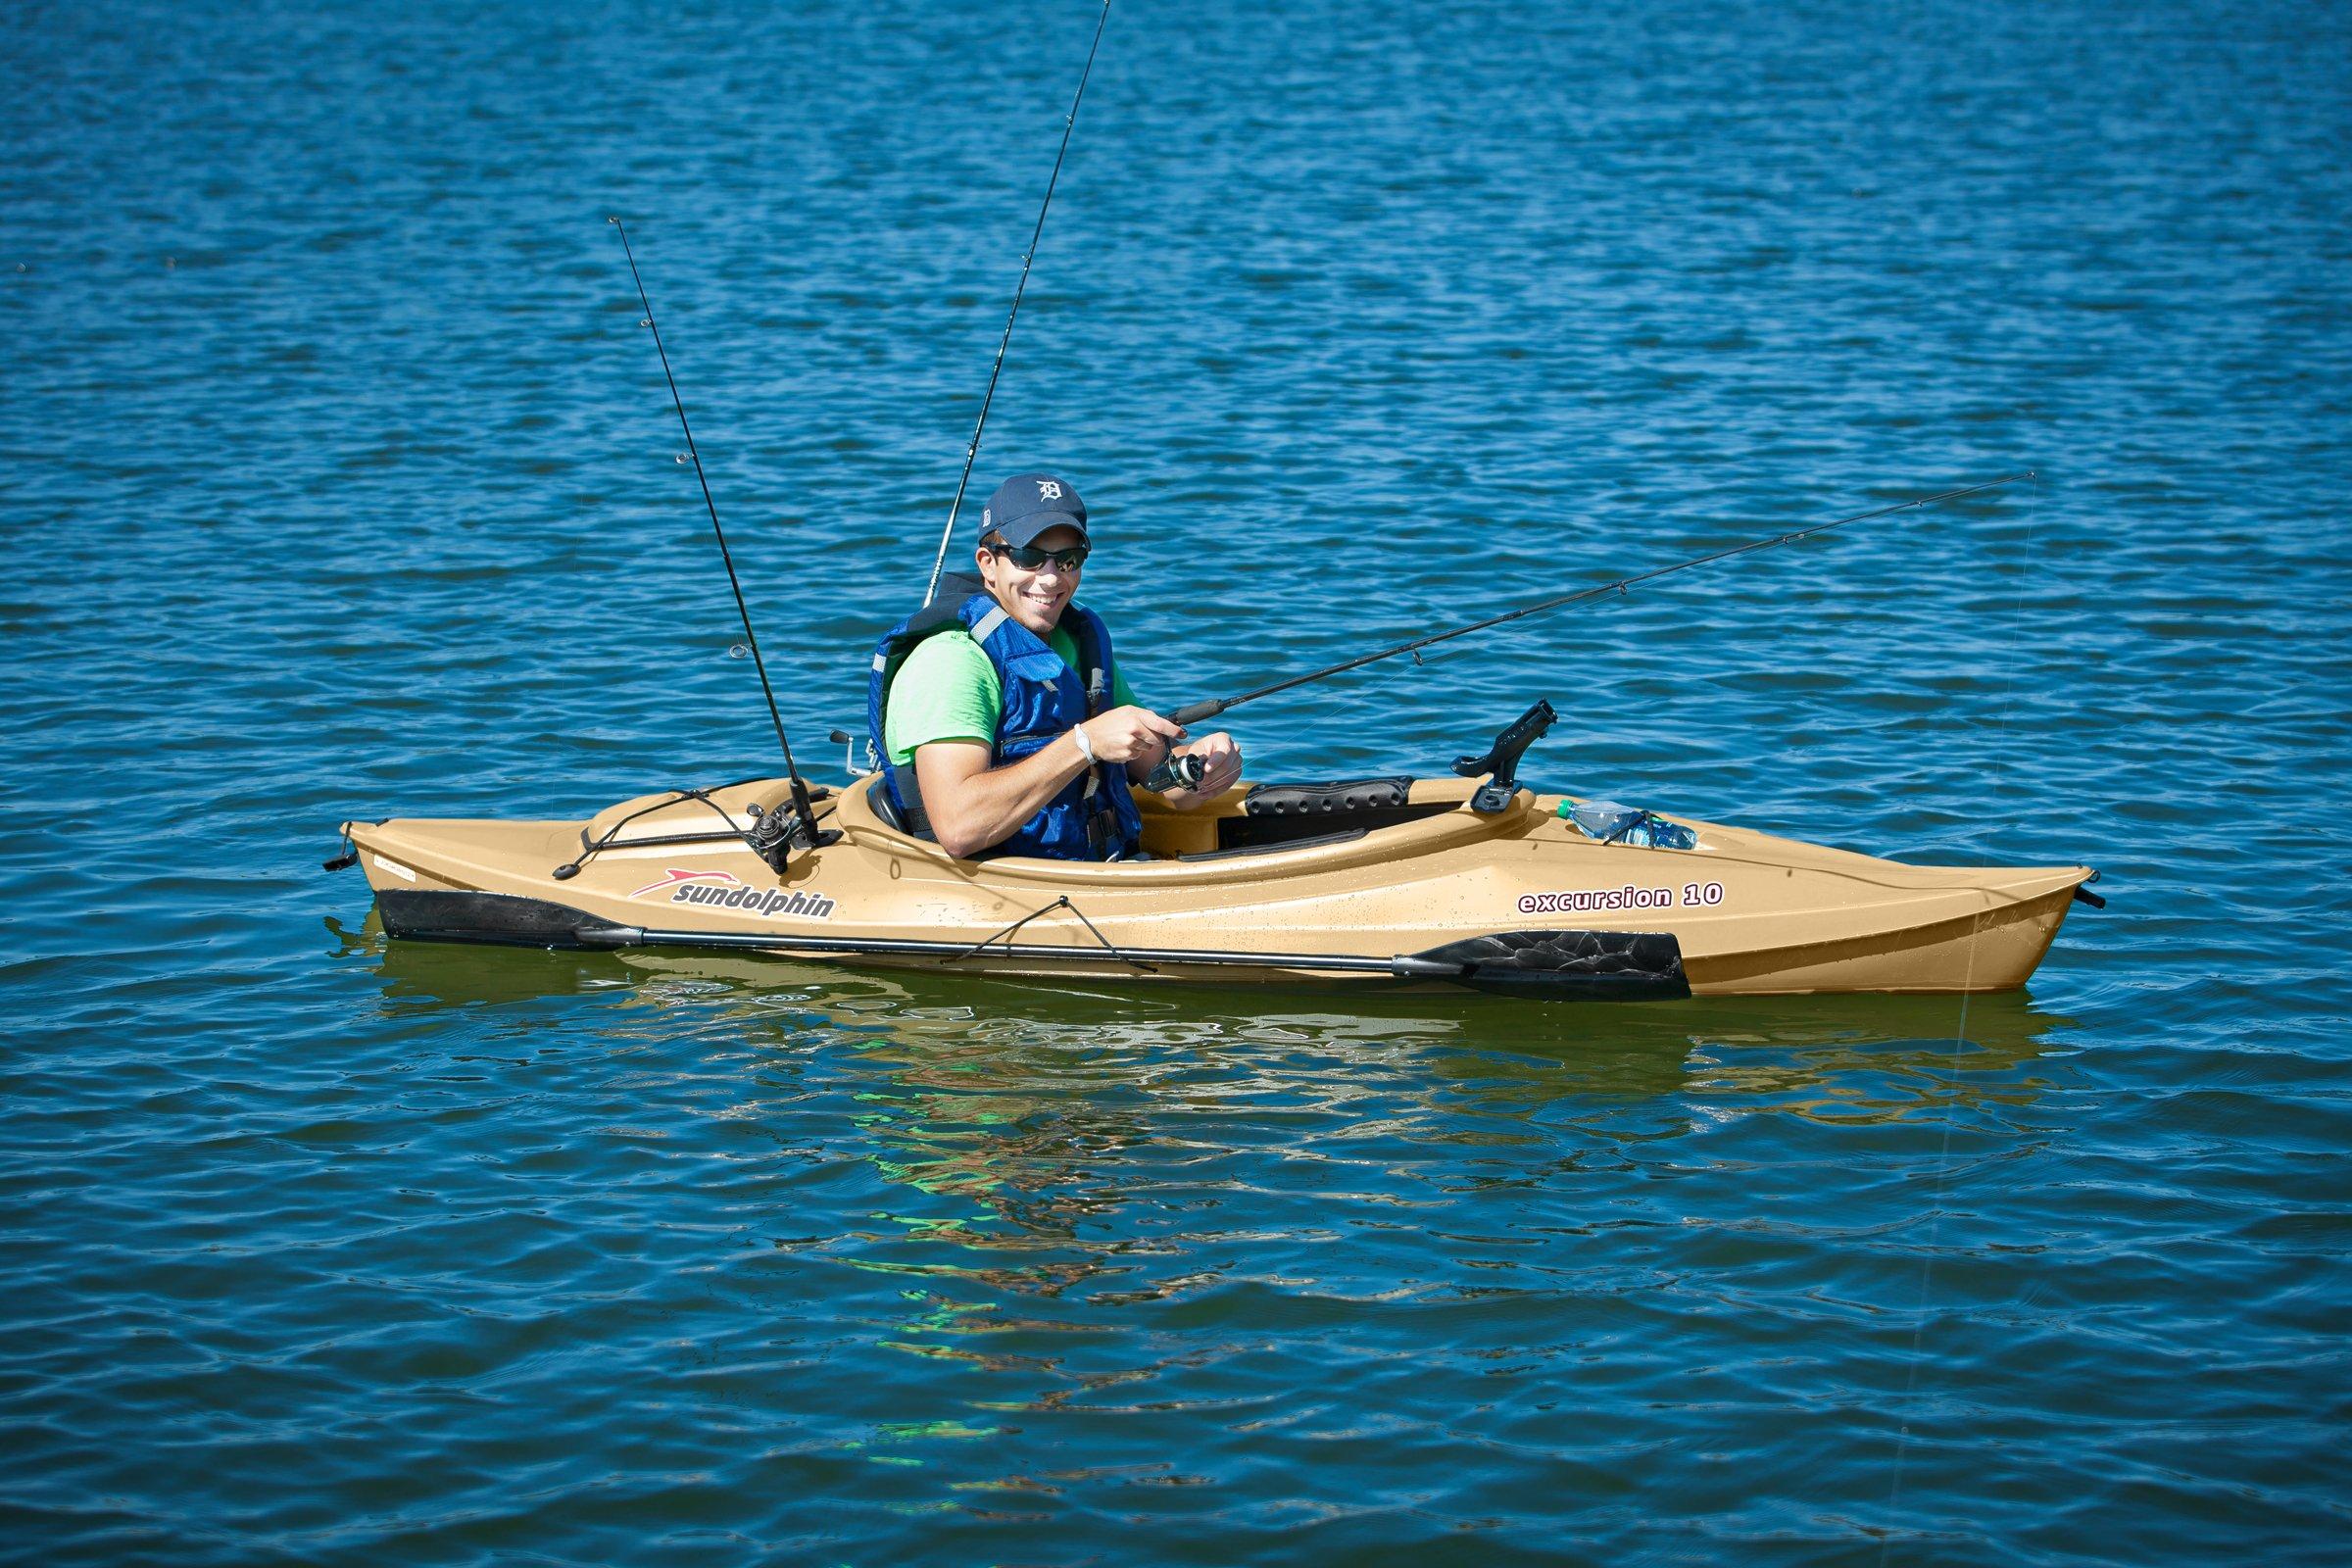 Sun Dolphin Excursion 10 Fishing Kayak Review 6